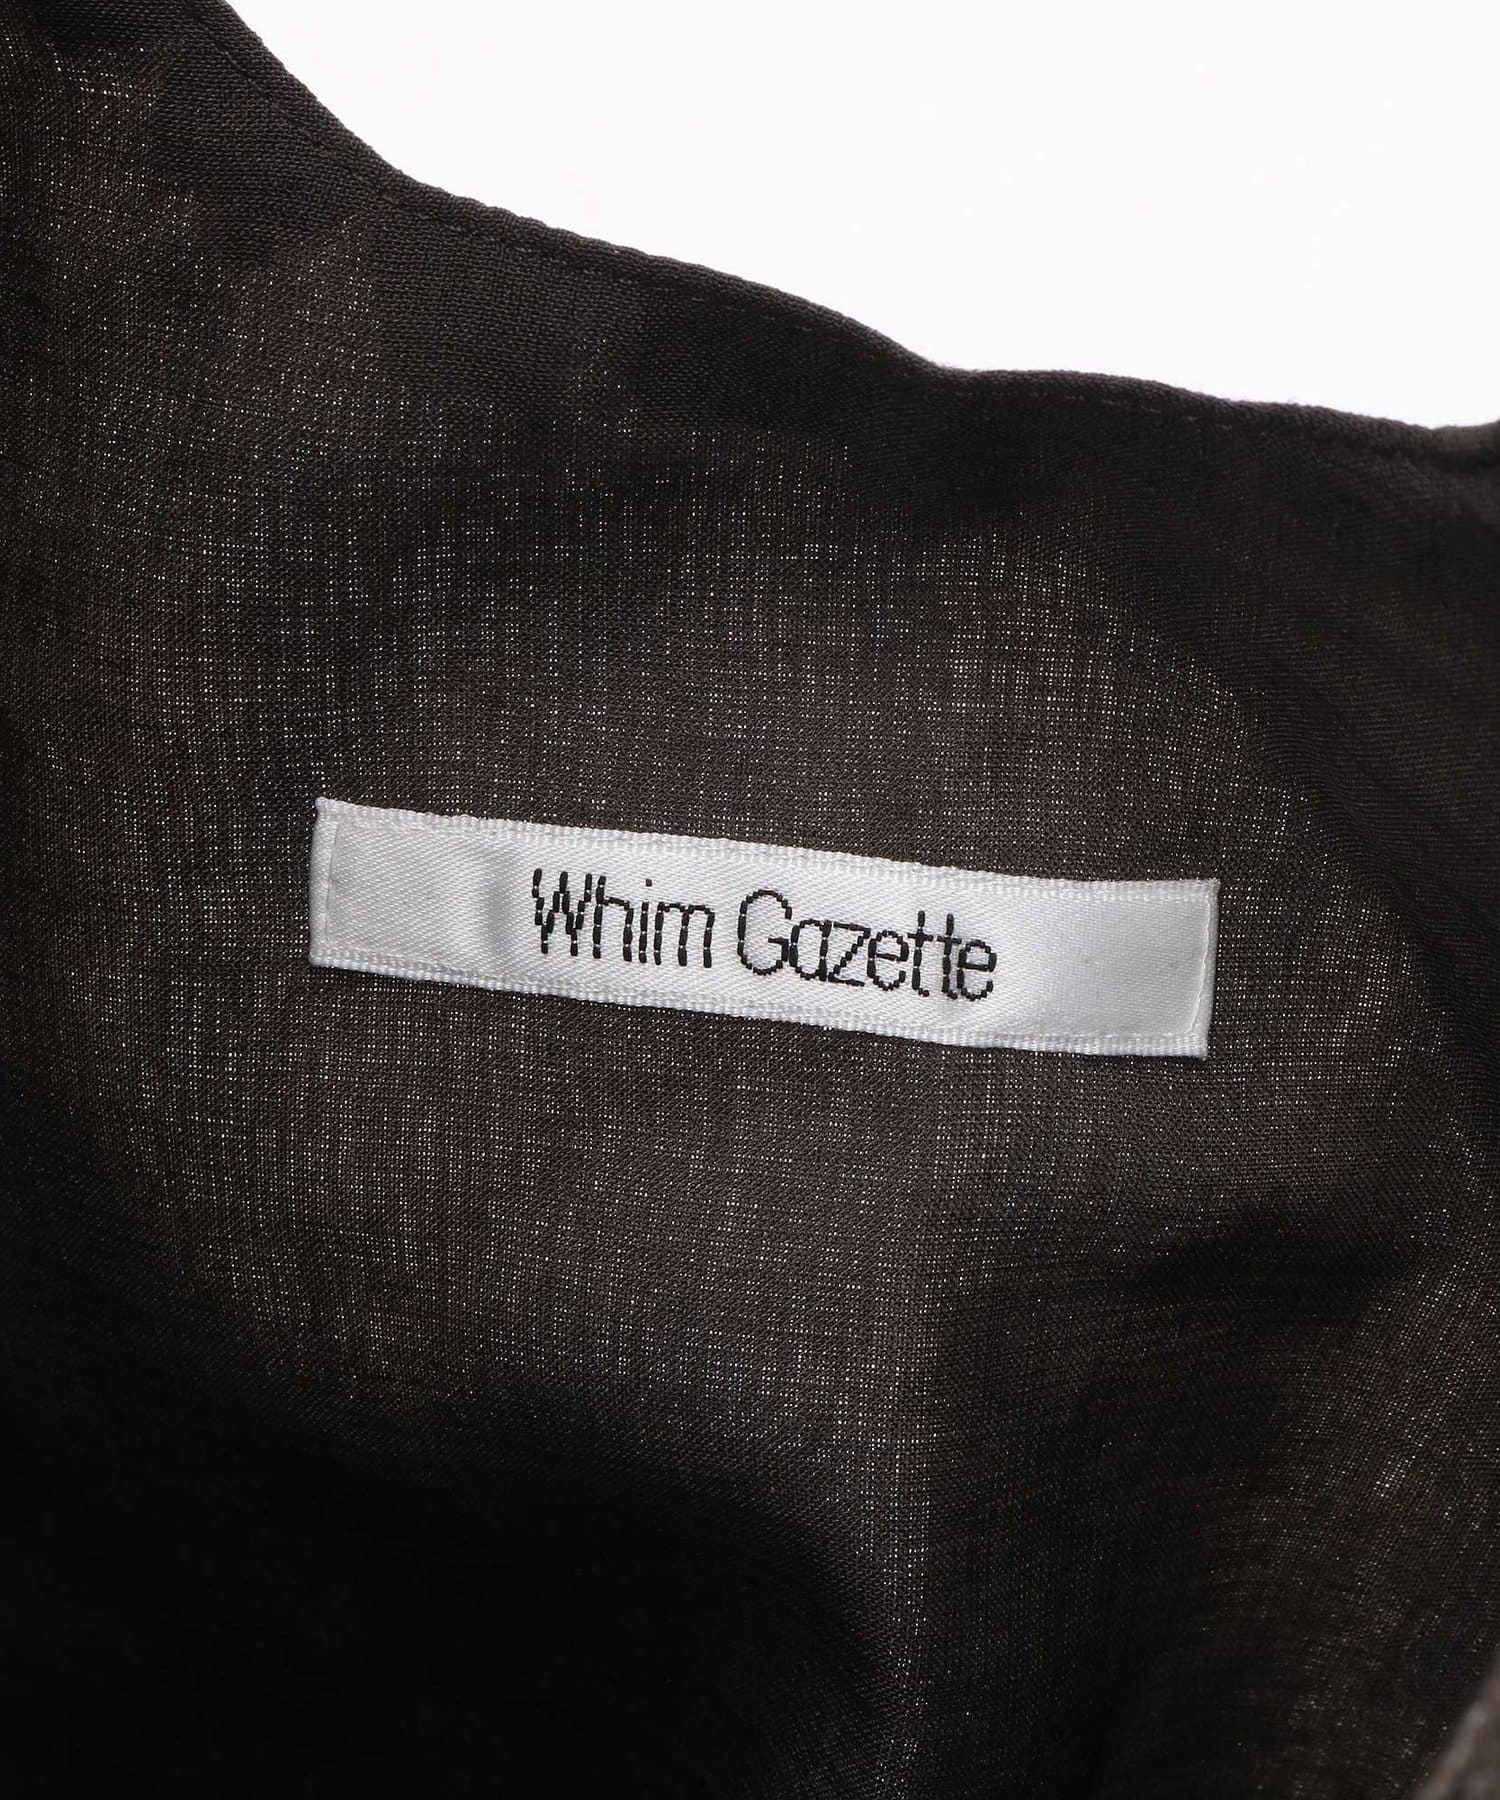 Whim Gazette(ウィム ガゼット) ハイエナプリントBAG